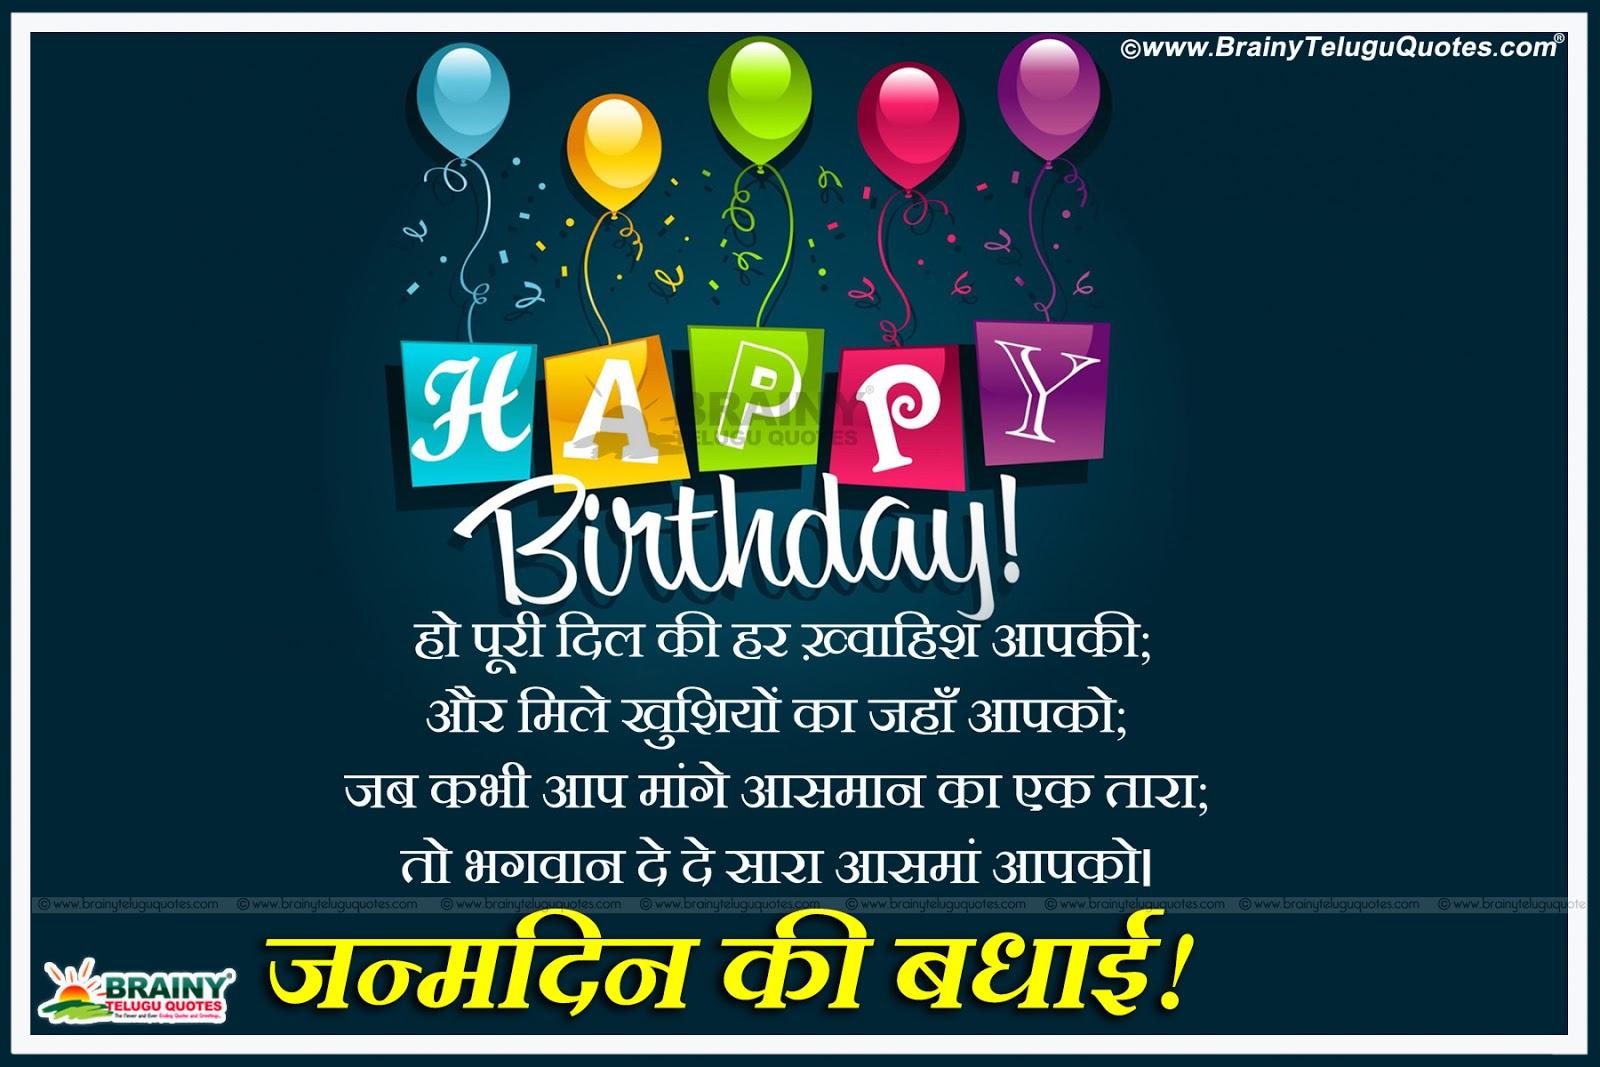 Birthday message in english language birthday wishes for husband birthday message in english language birthday wishes in hindi pictures shayari greetings kristyandbryce Gallery